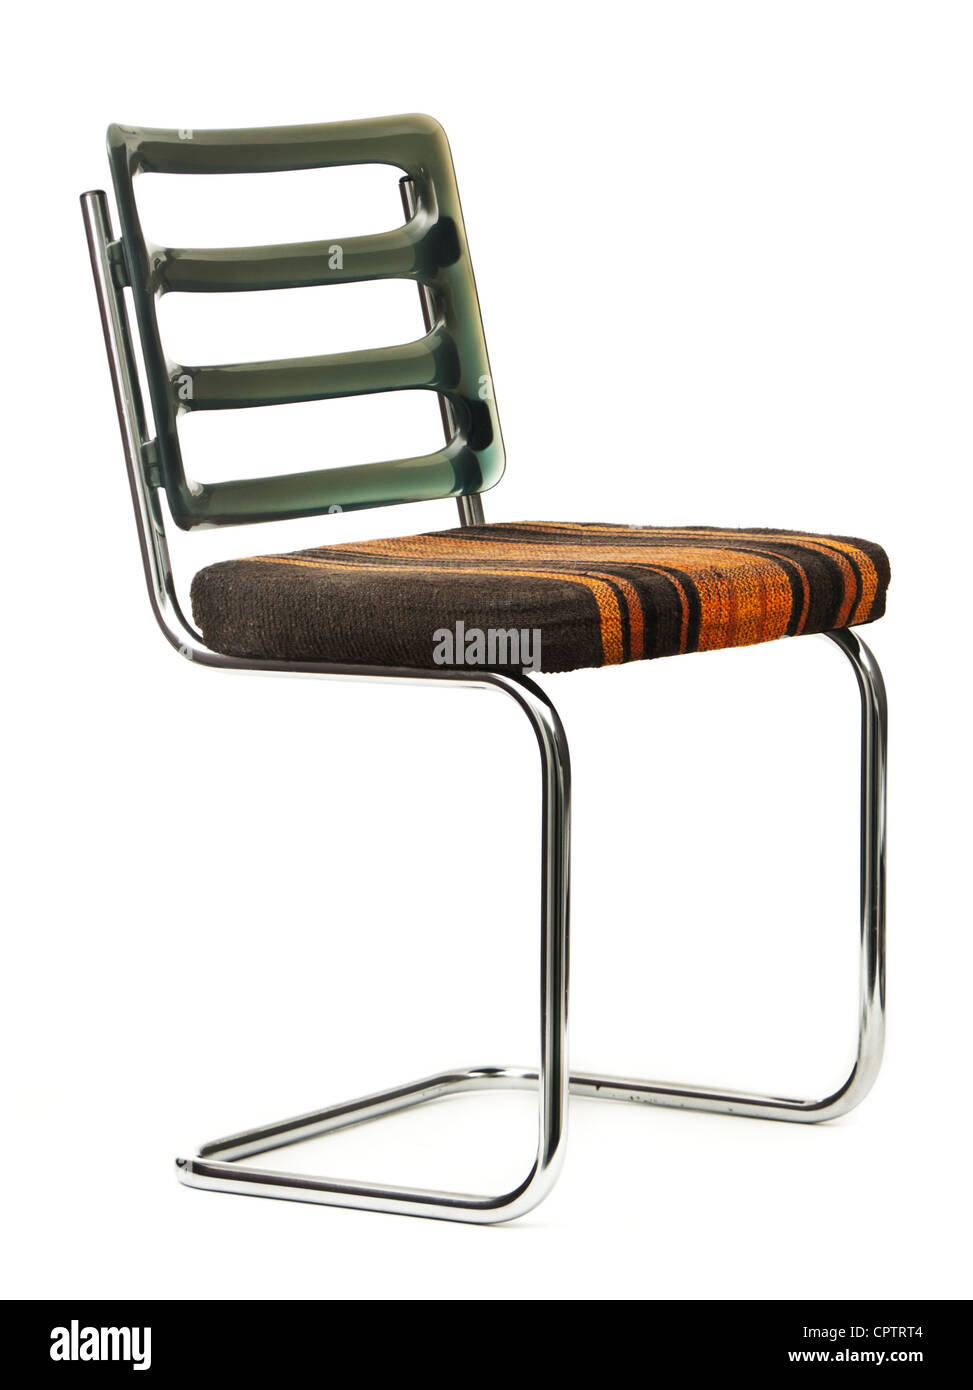 Jahrgang 1970 Gepolsterte Freischwinger Dieses Klassische Design